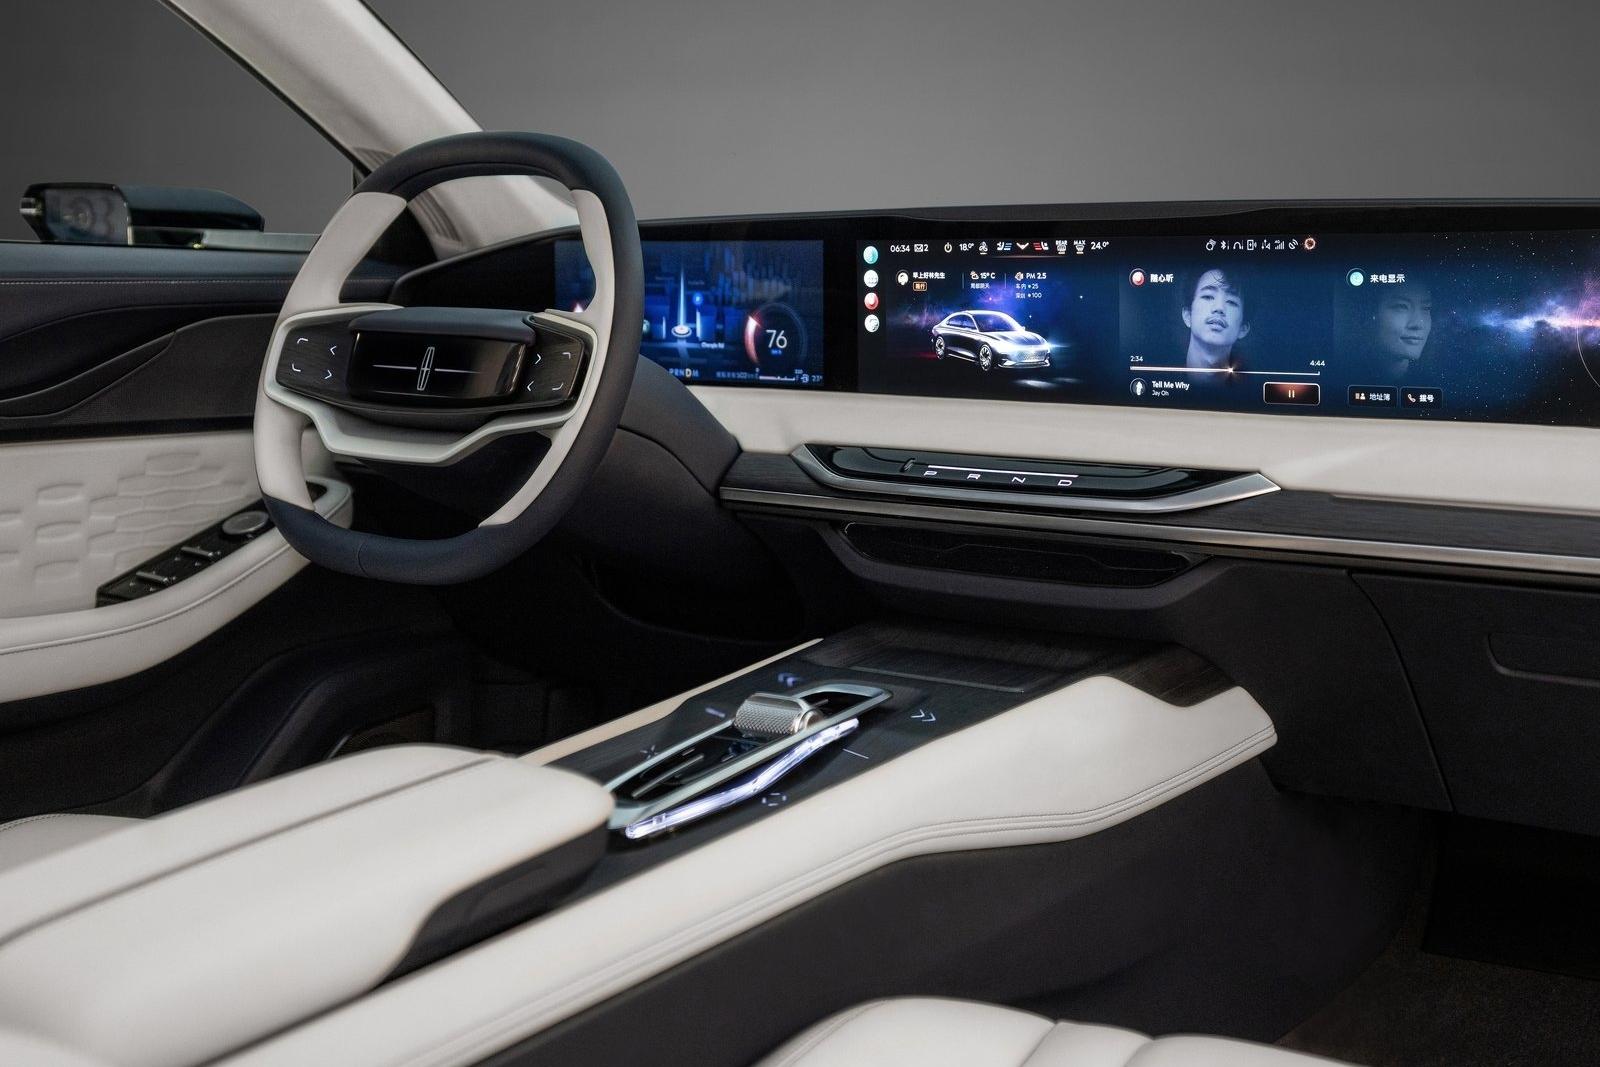 Lincoln-Zephyr_Reflection_Concept-2021-1600-04